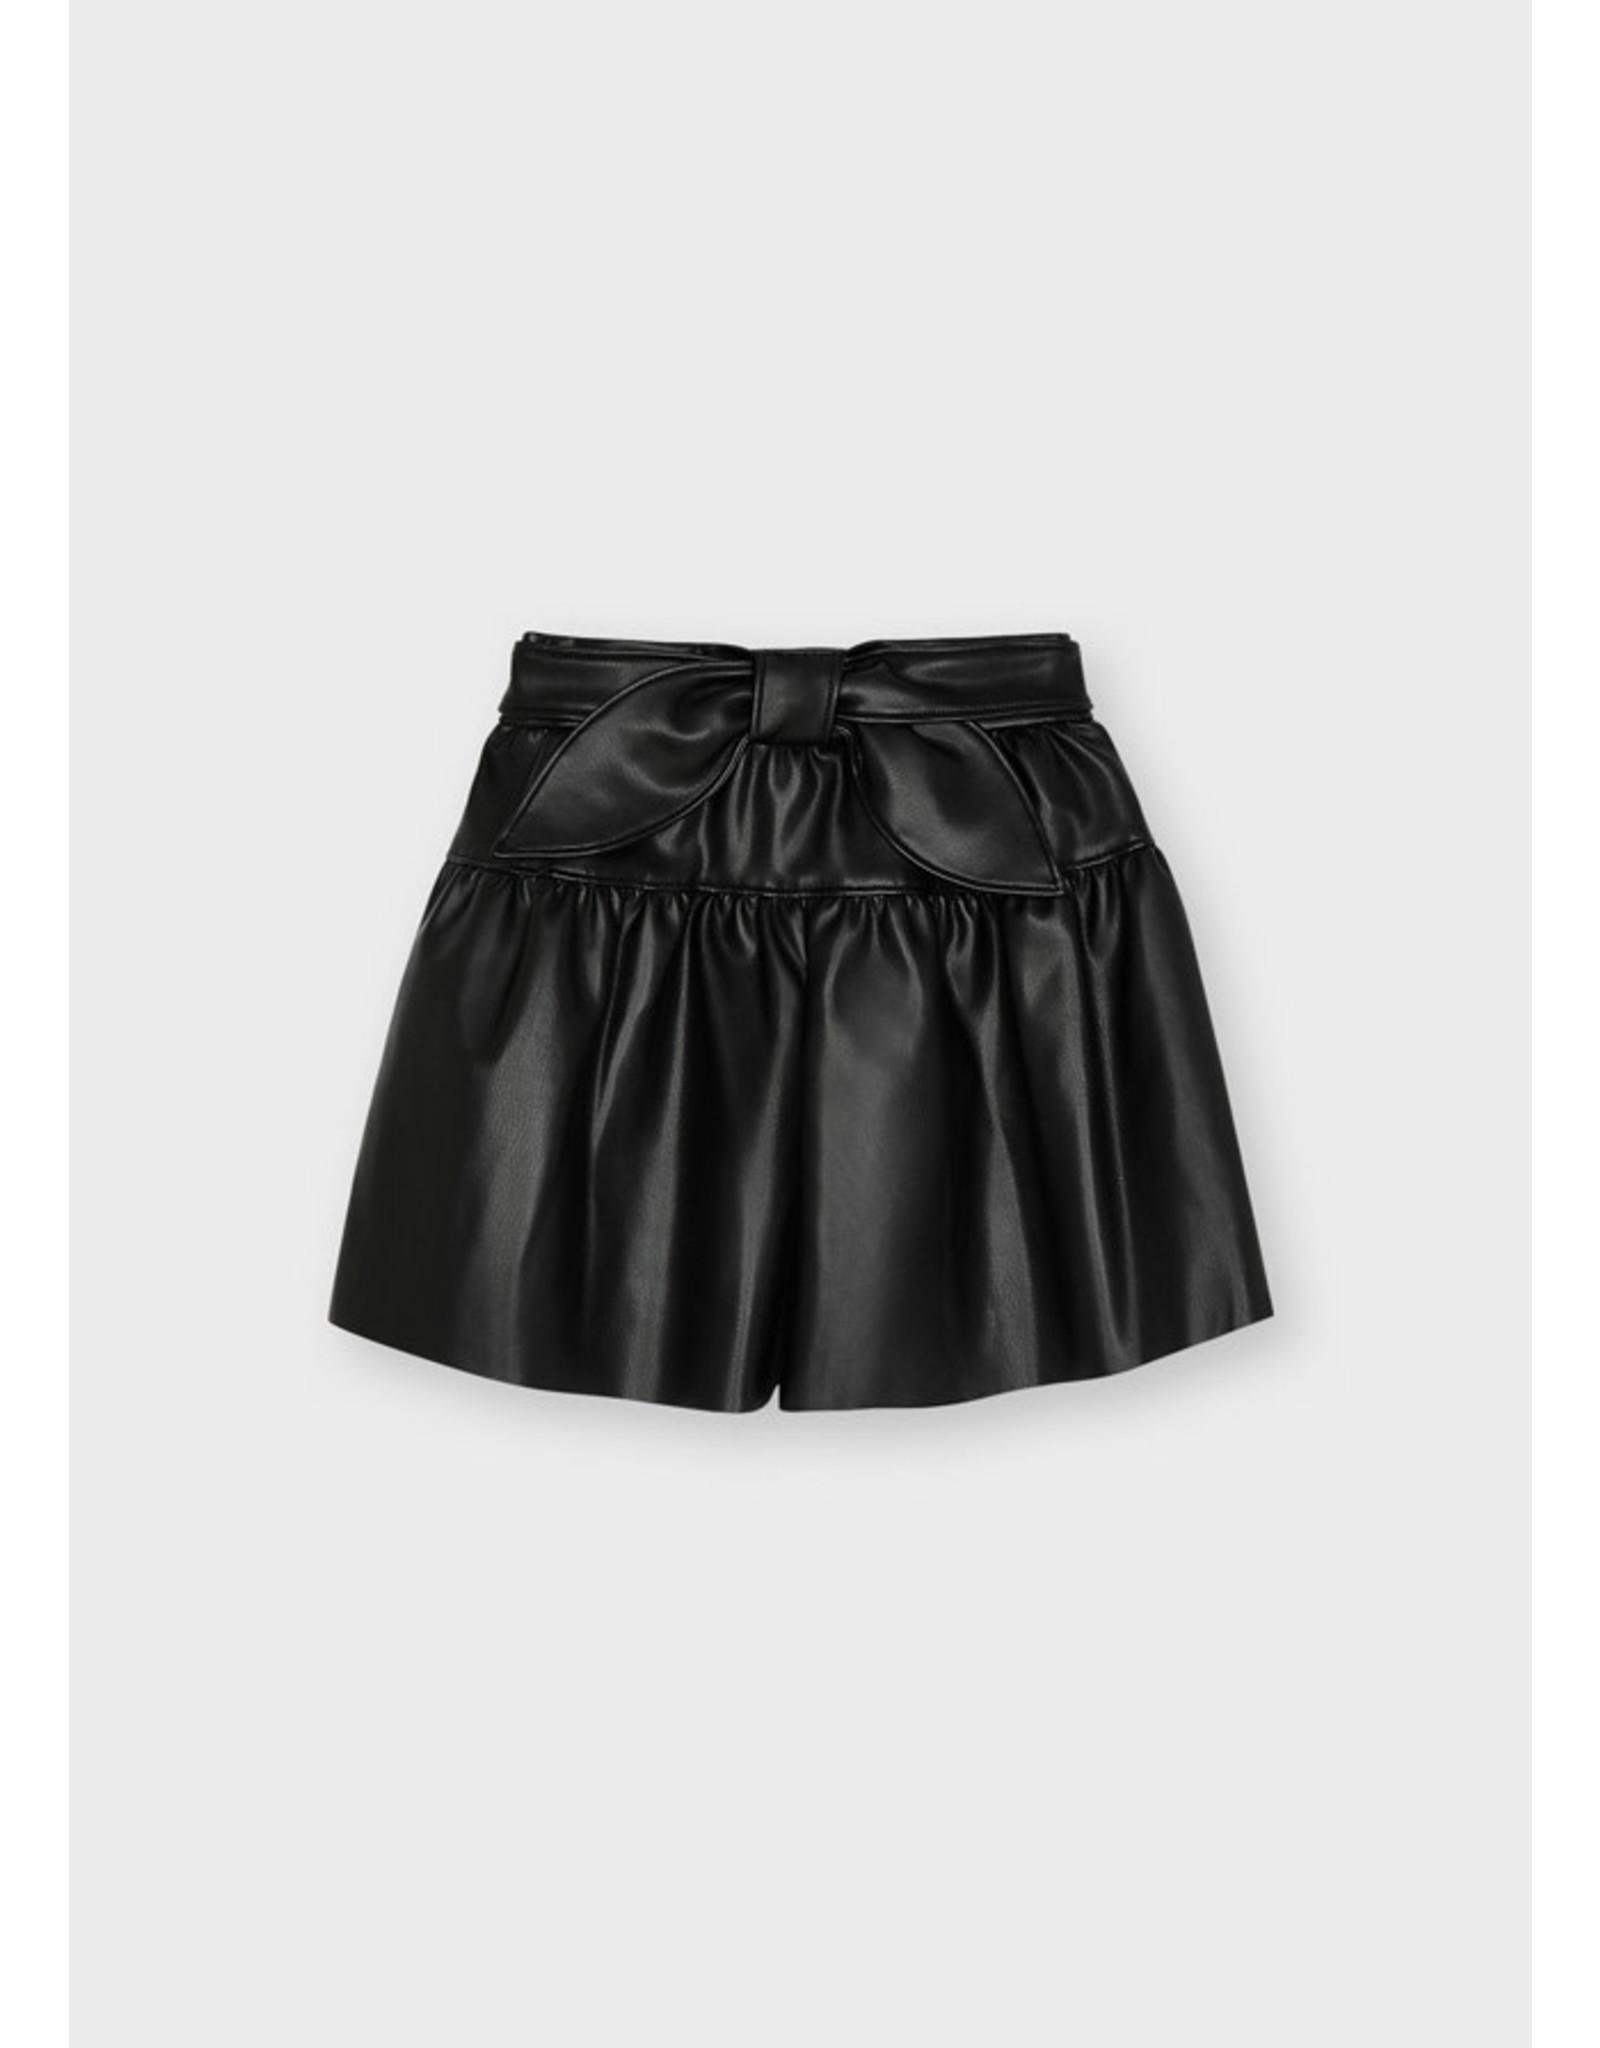 Mayoral Black Leathered Skirt